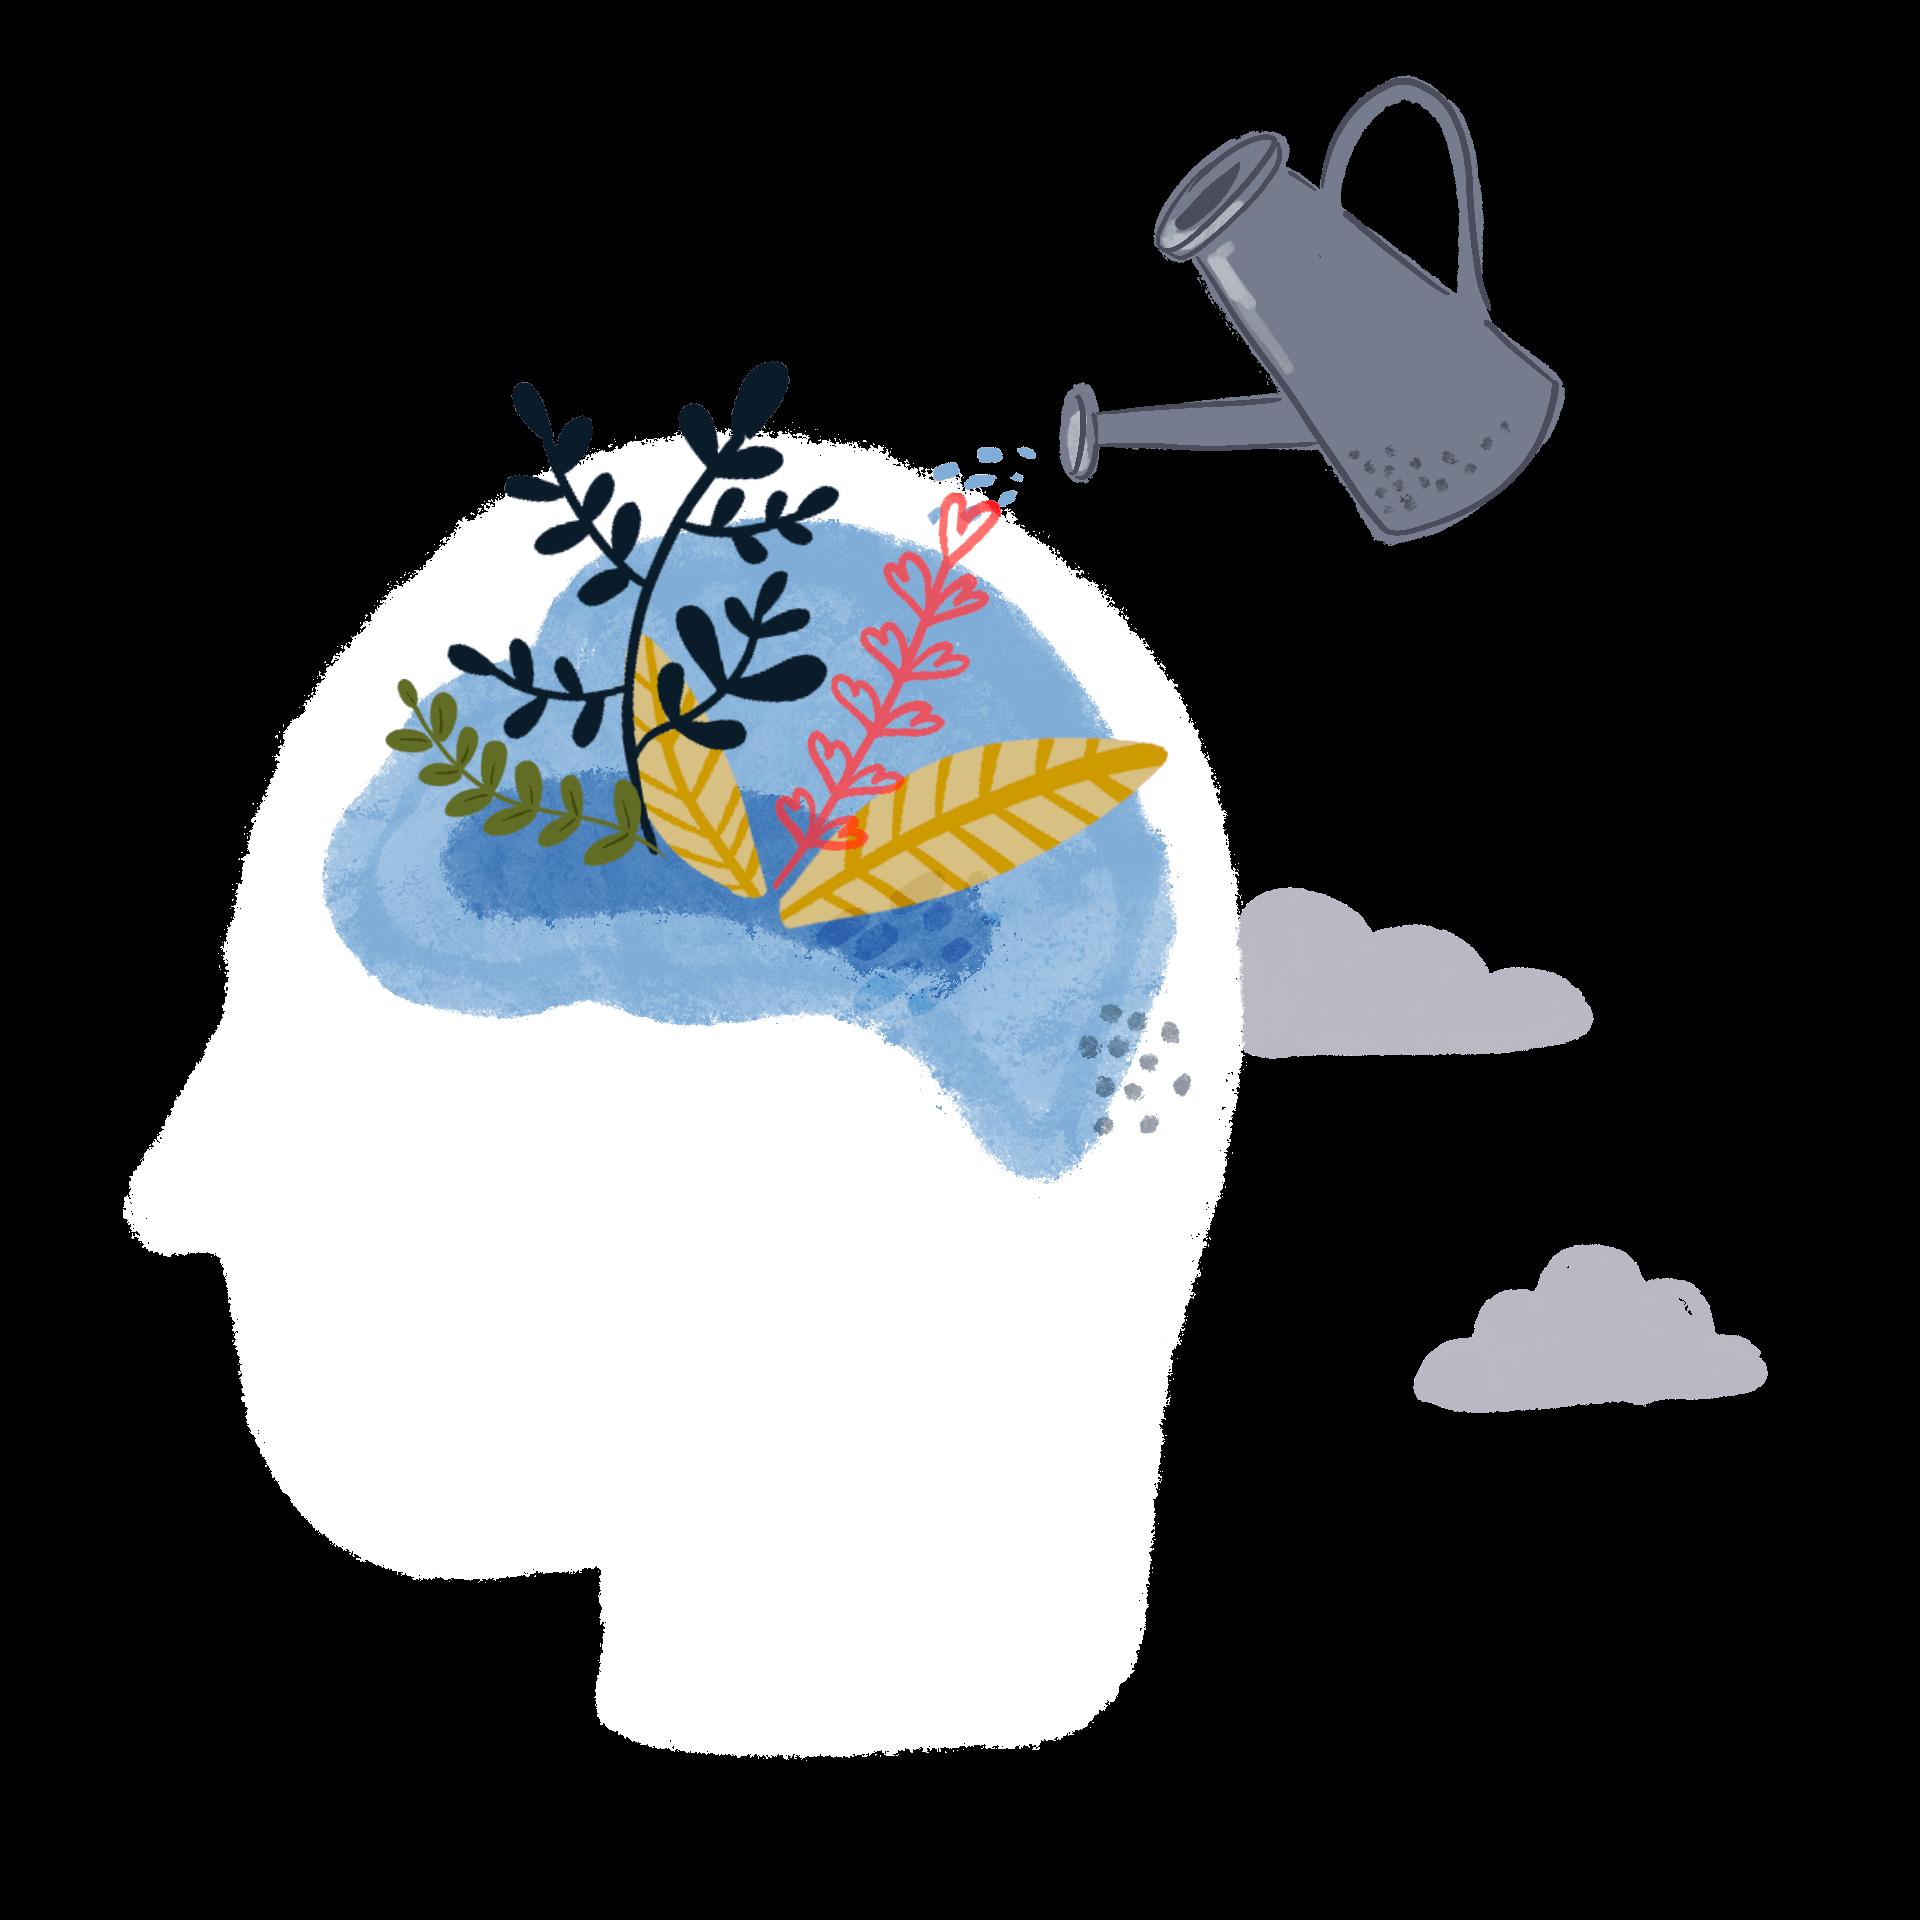 Deep thinking illustration